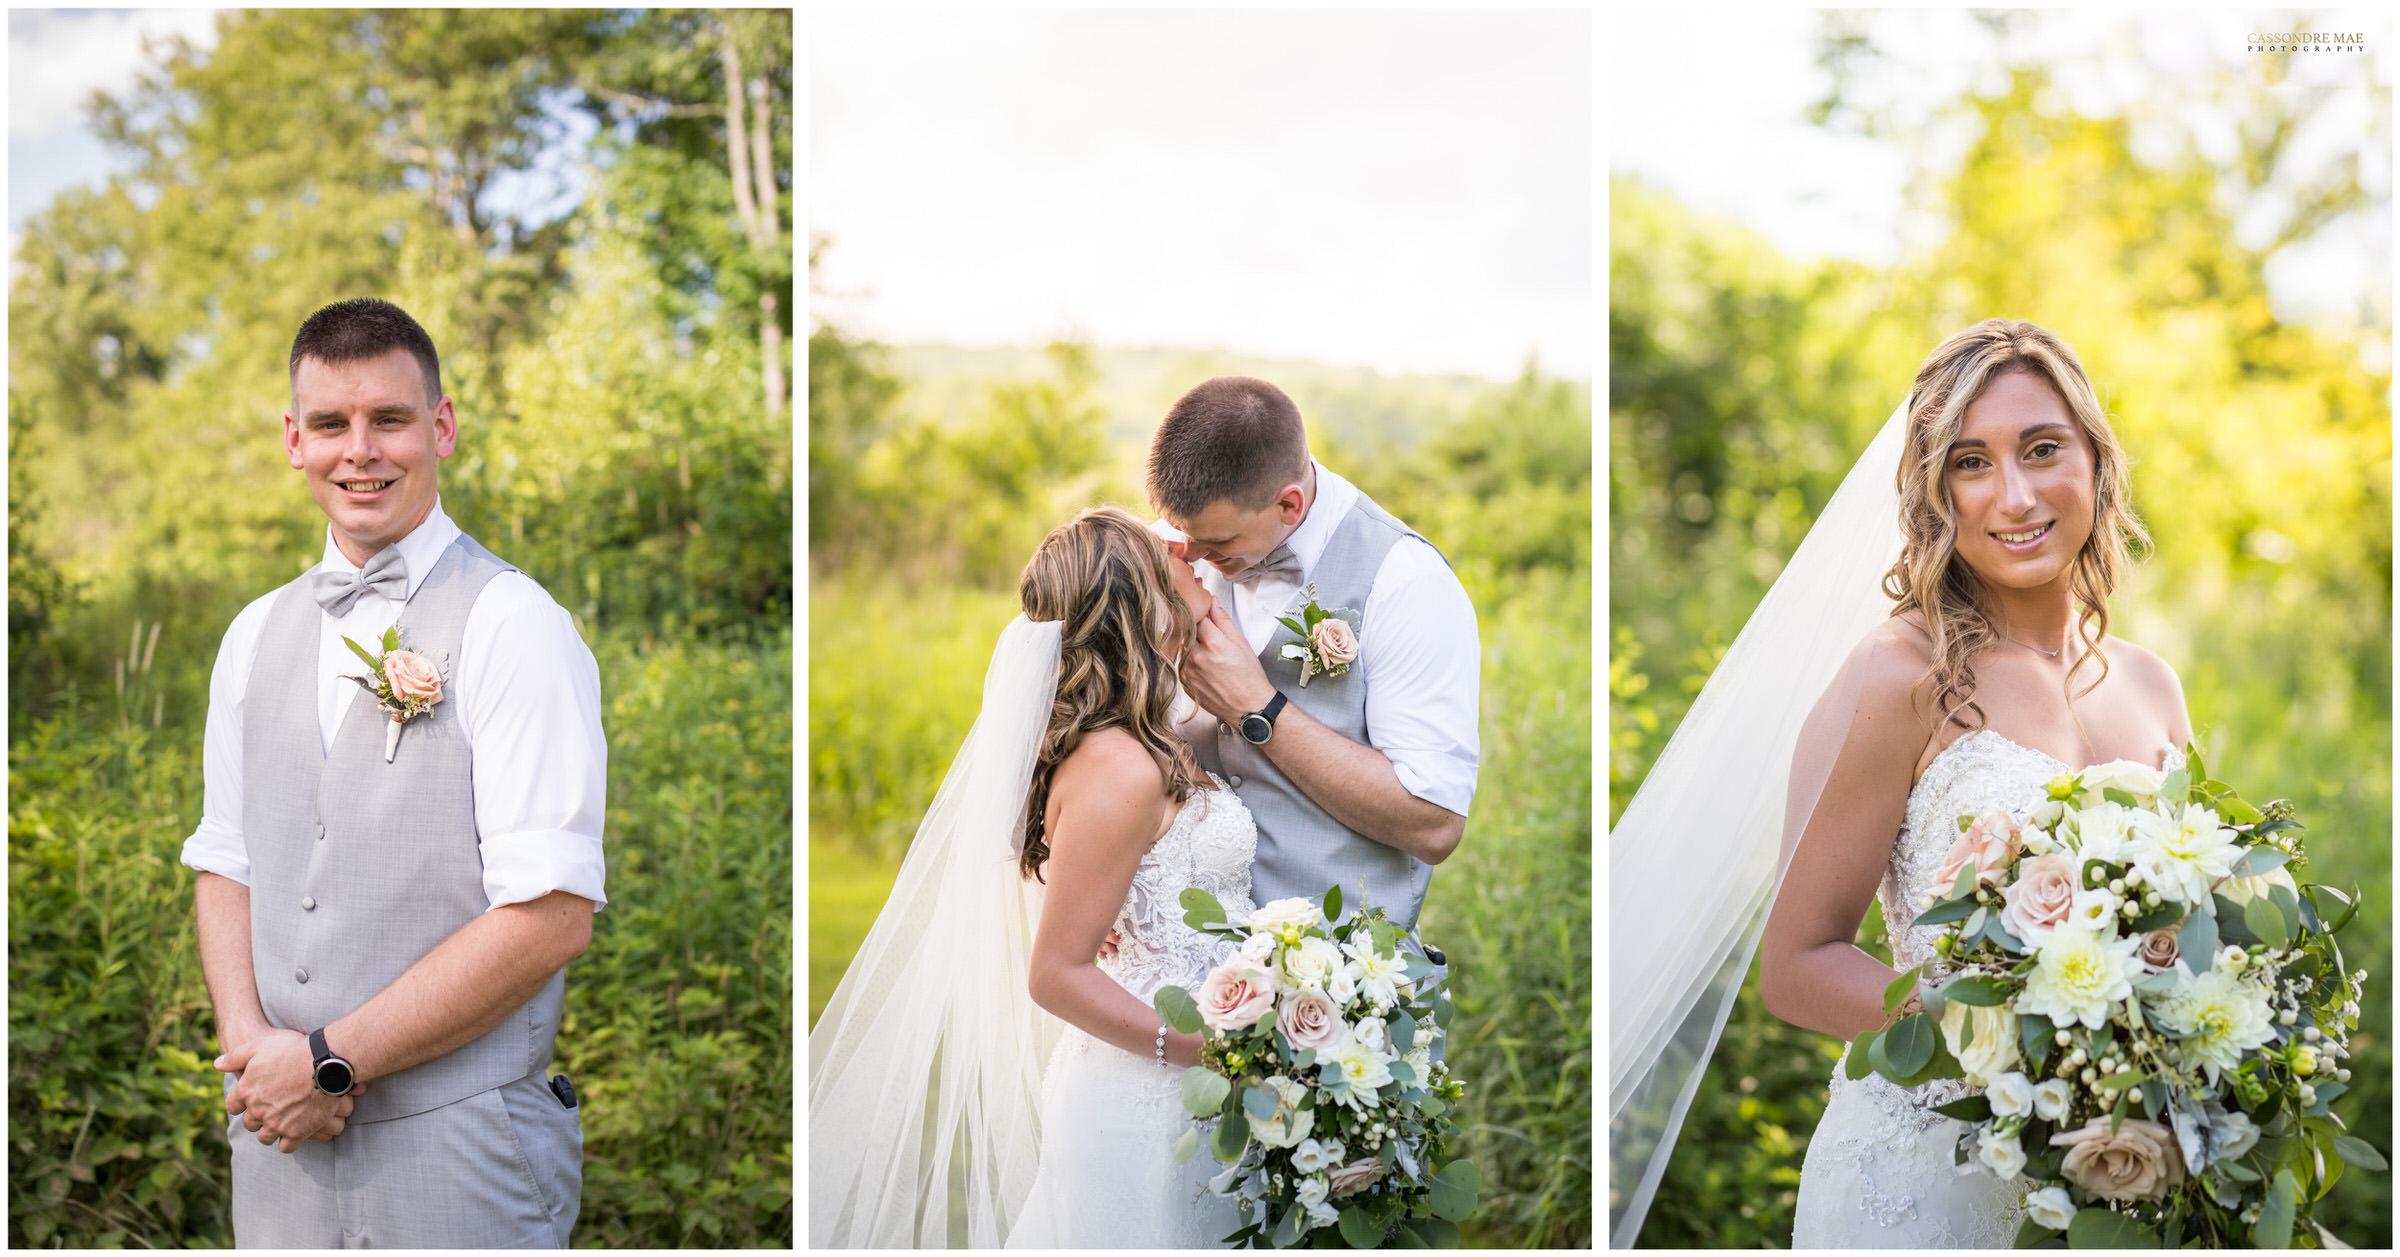 Cassondre Mae Photography Hudson Valley Wedding 21.jpg